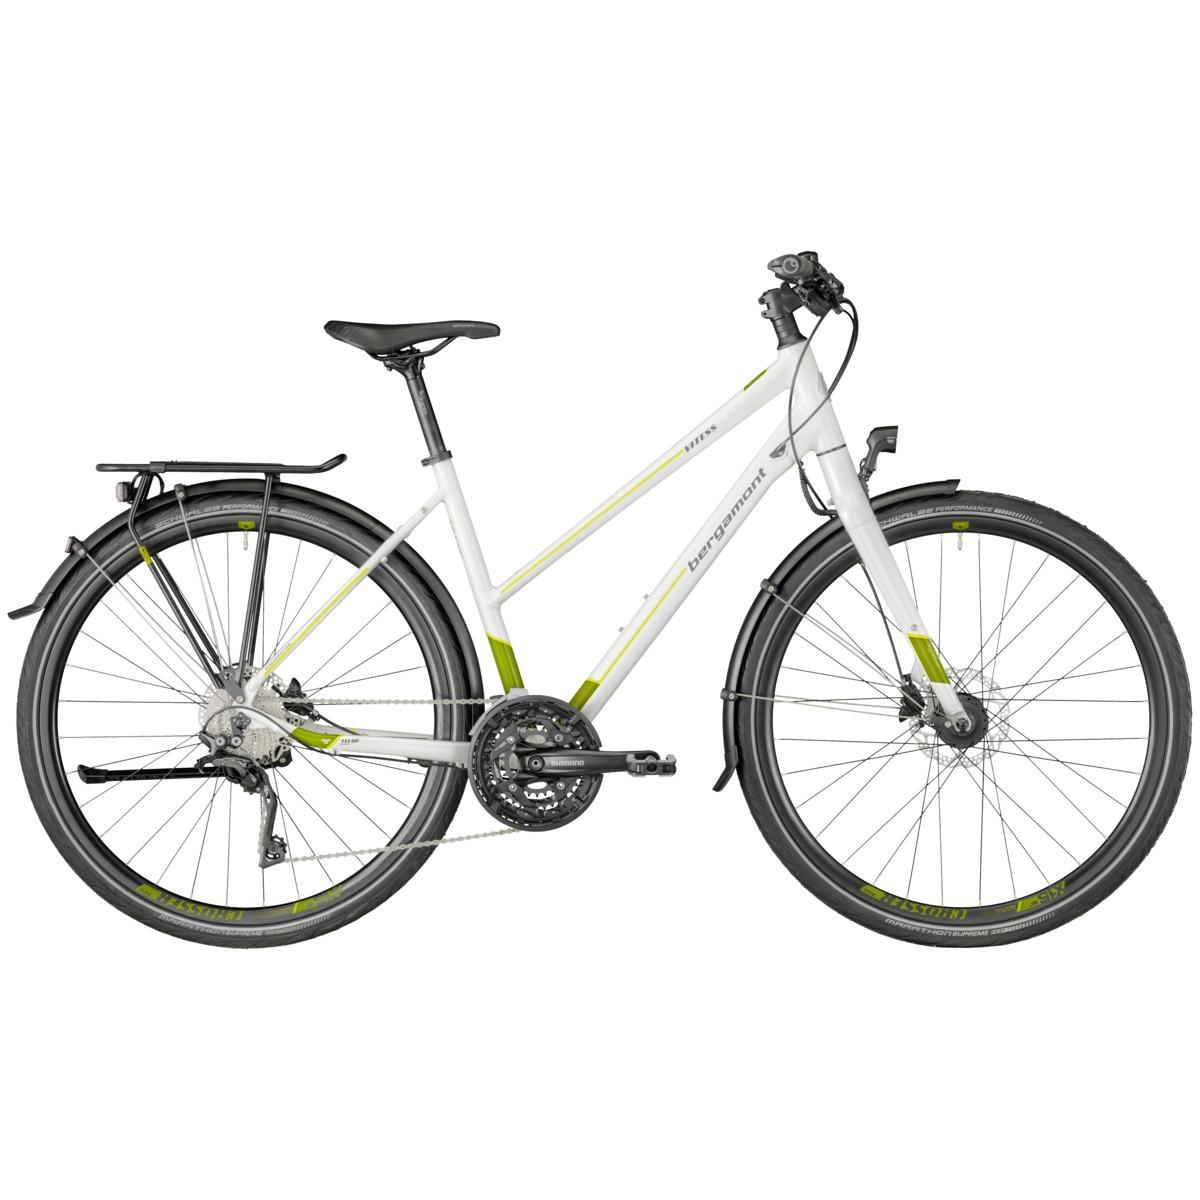 bergamont vitess 7 0 damen trekking fahrrad wei gr n 2018. Black Bedroom Furniture Sets. Home Design Ideas